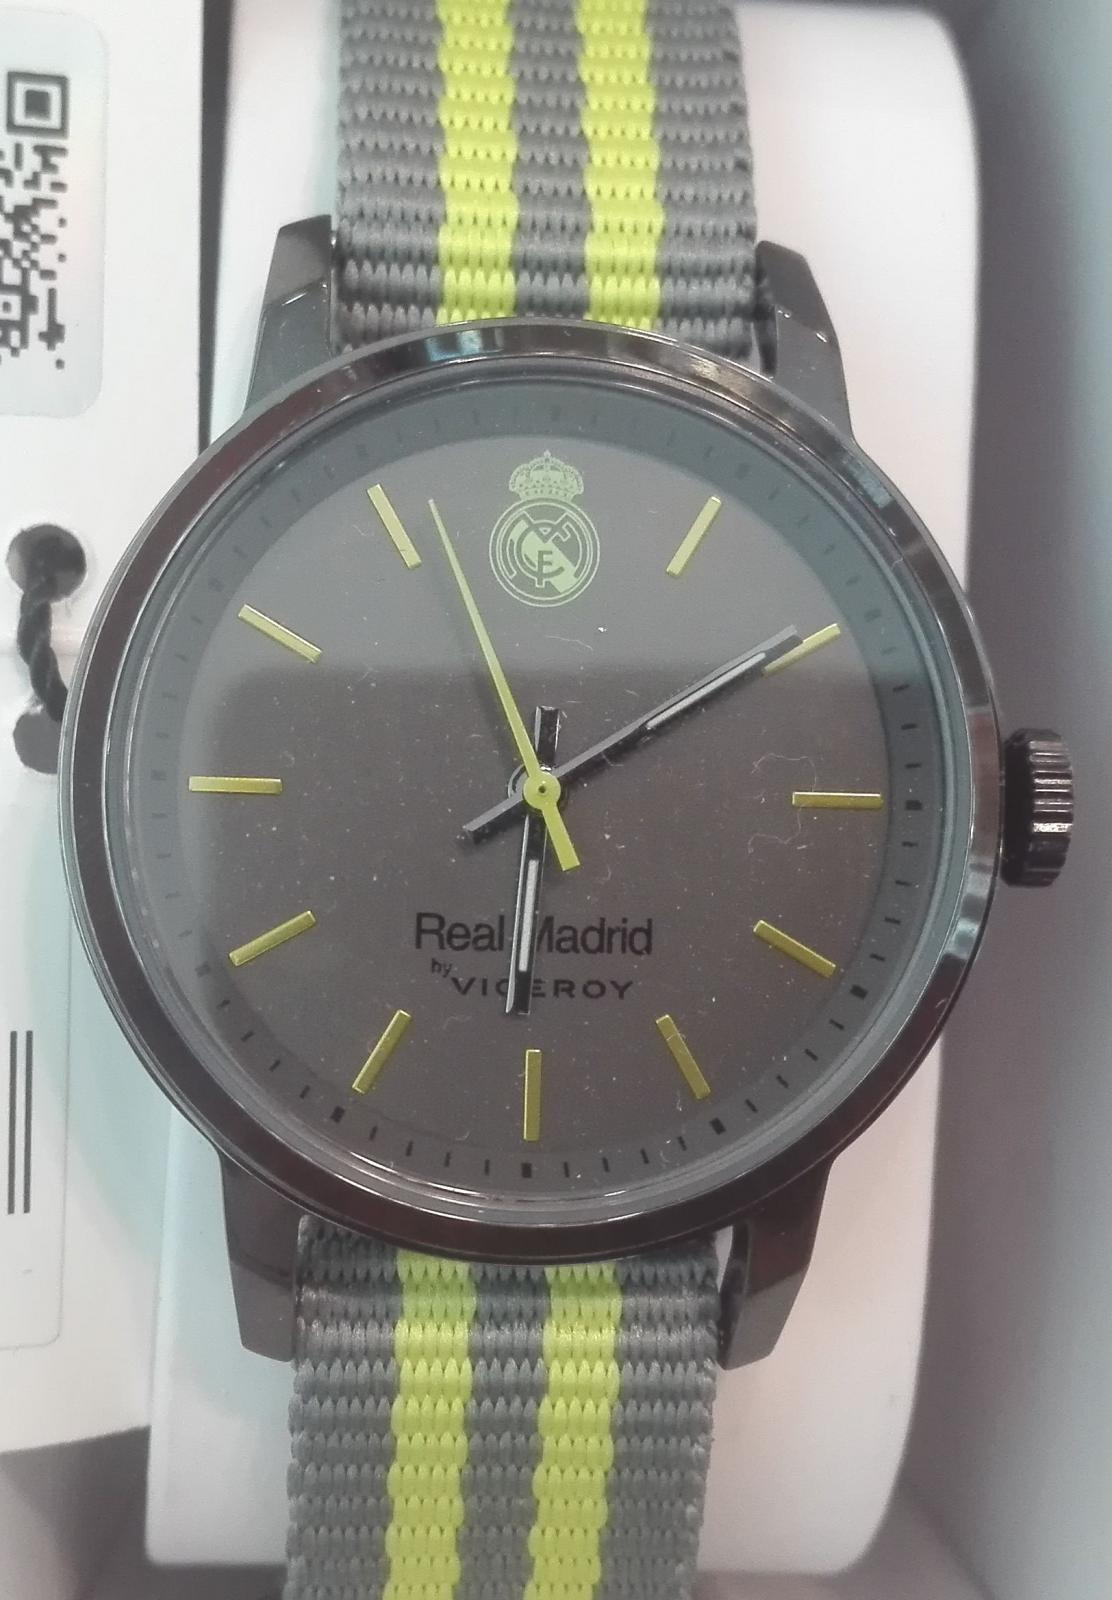 ¡Cómpraselo! Reloj Viceroy Real Madrid 40966-17 Tamaño Cadete